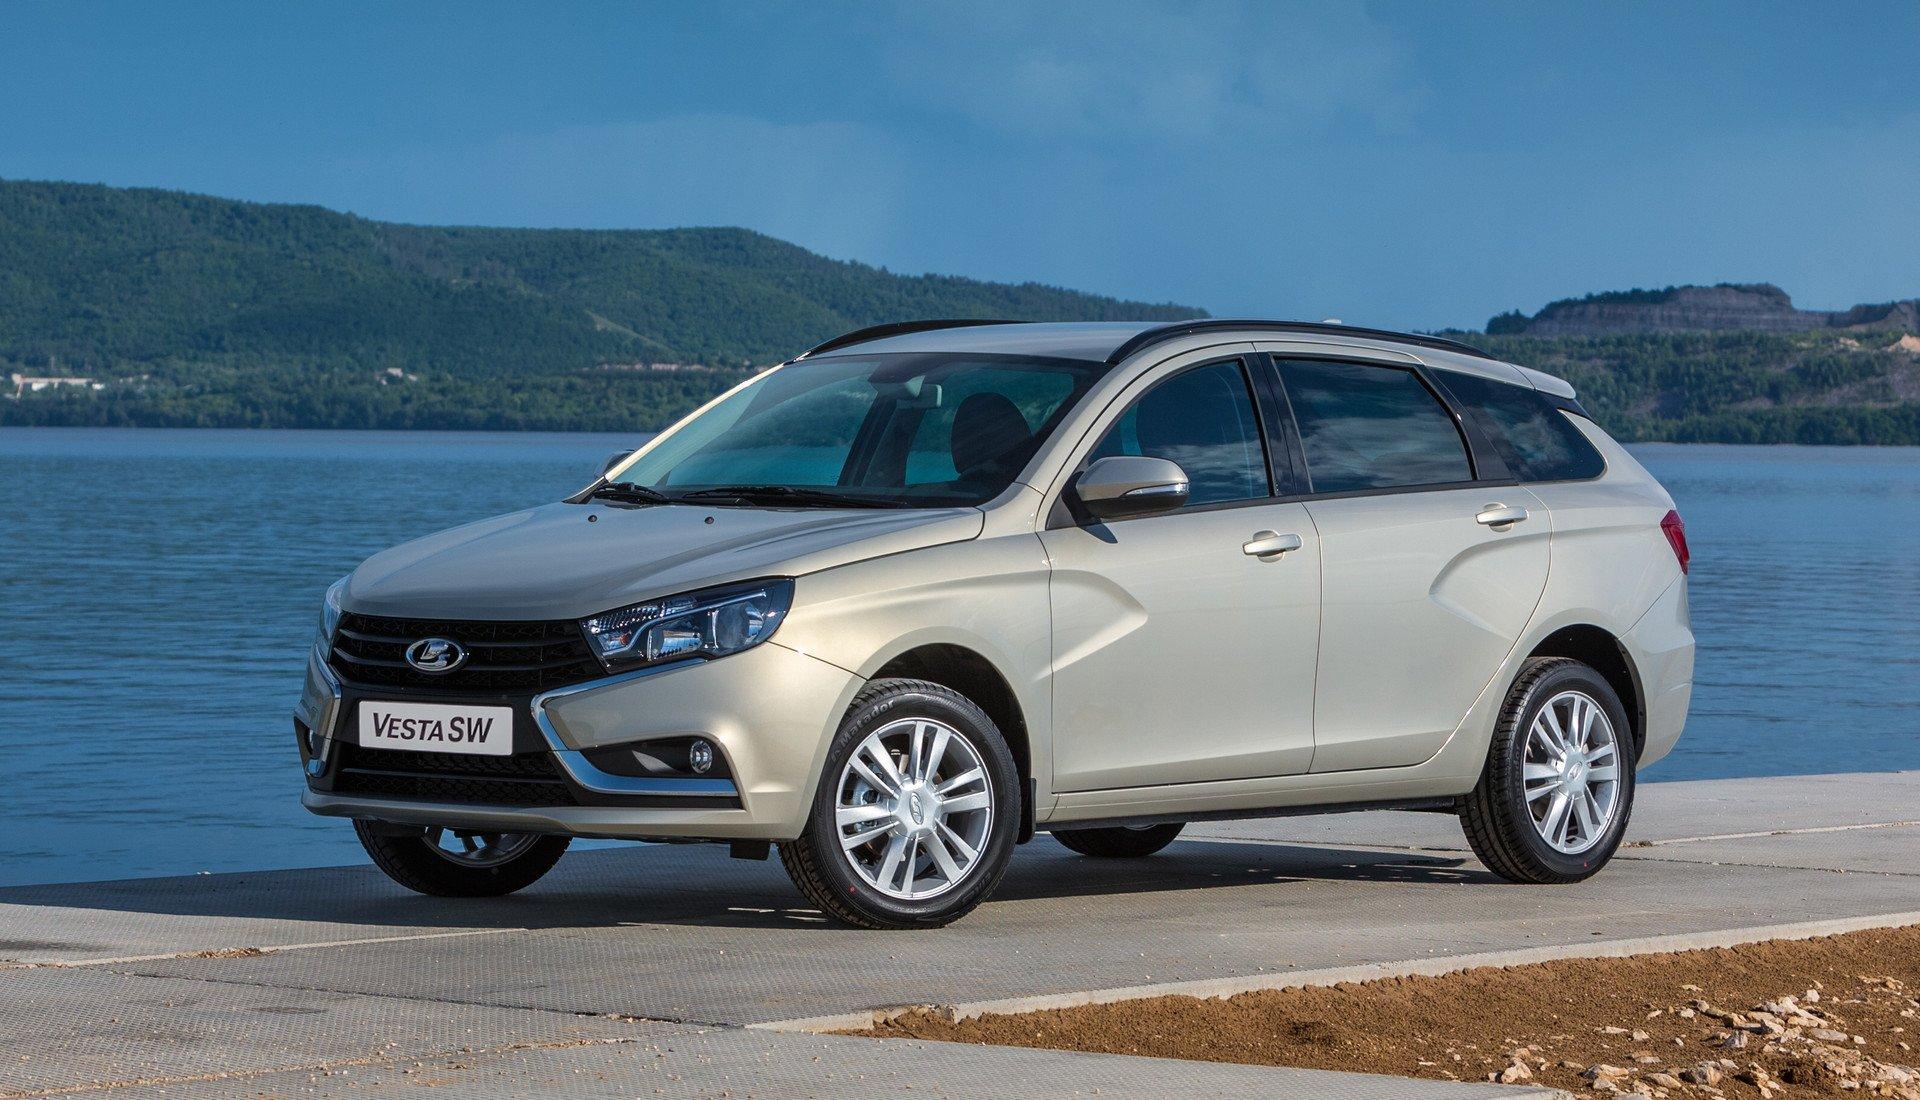 1000 километров без дозаправки: «АвтоВАЗ» покроет спрос на Лада Vesta CNG